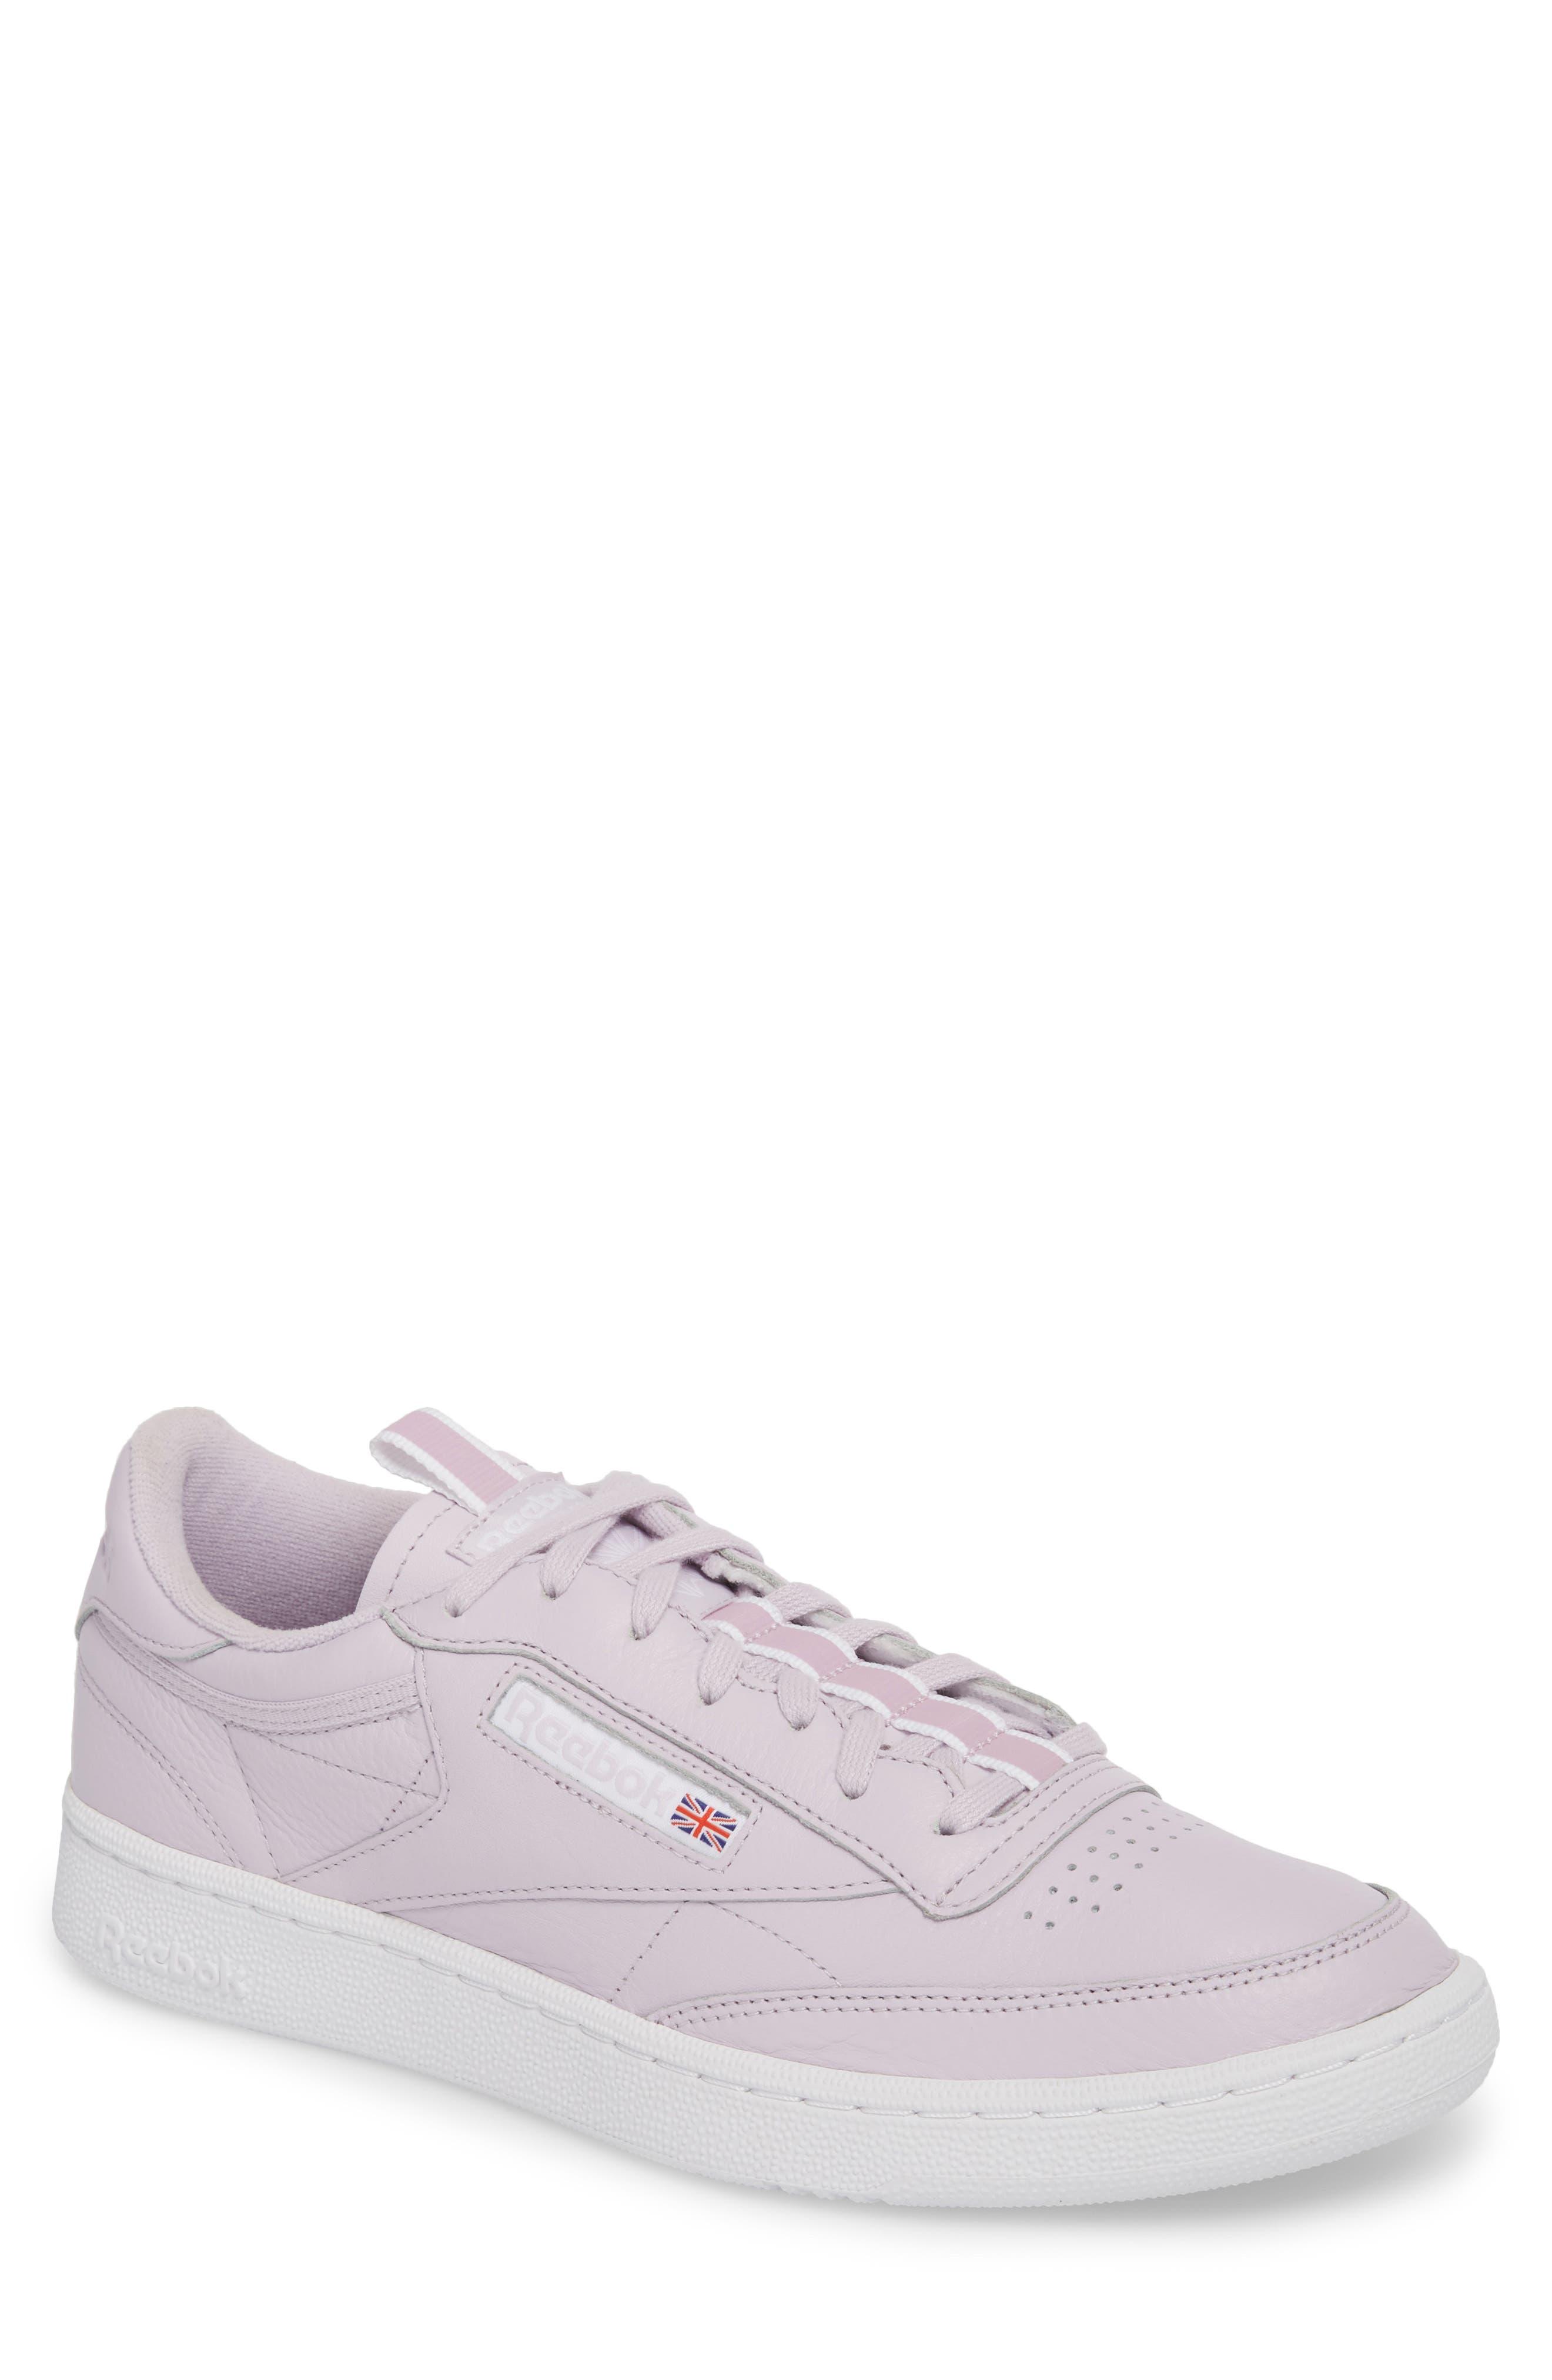 Club C 85 RT Sneaker,                             Main thumbnail 1, color,